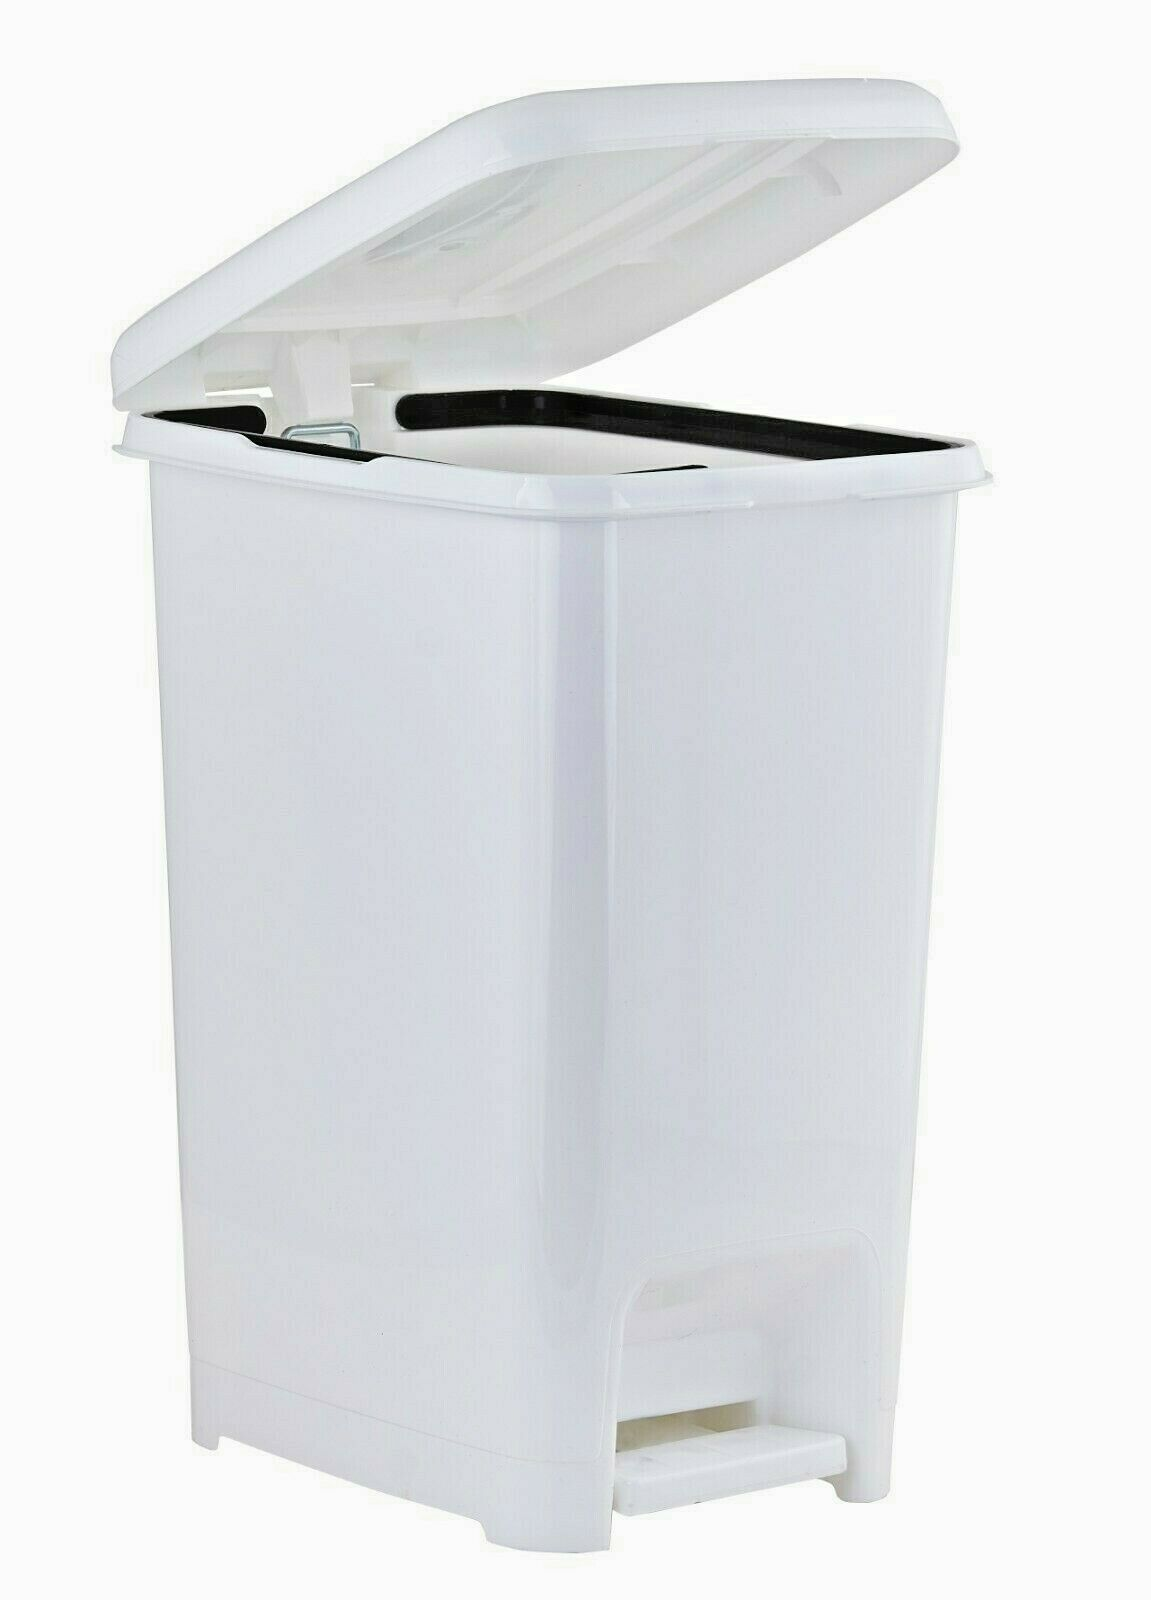 Plastic White Kitchen Trash Can Lid